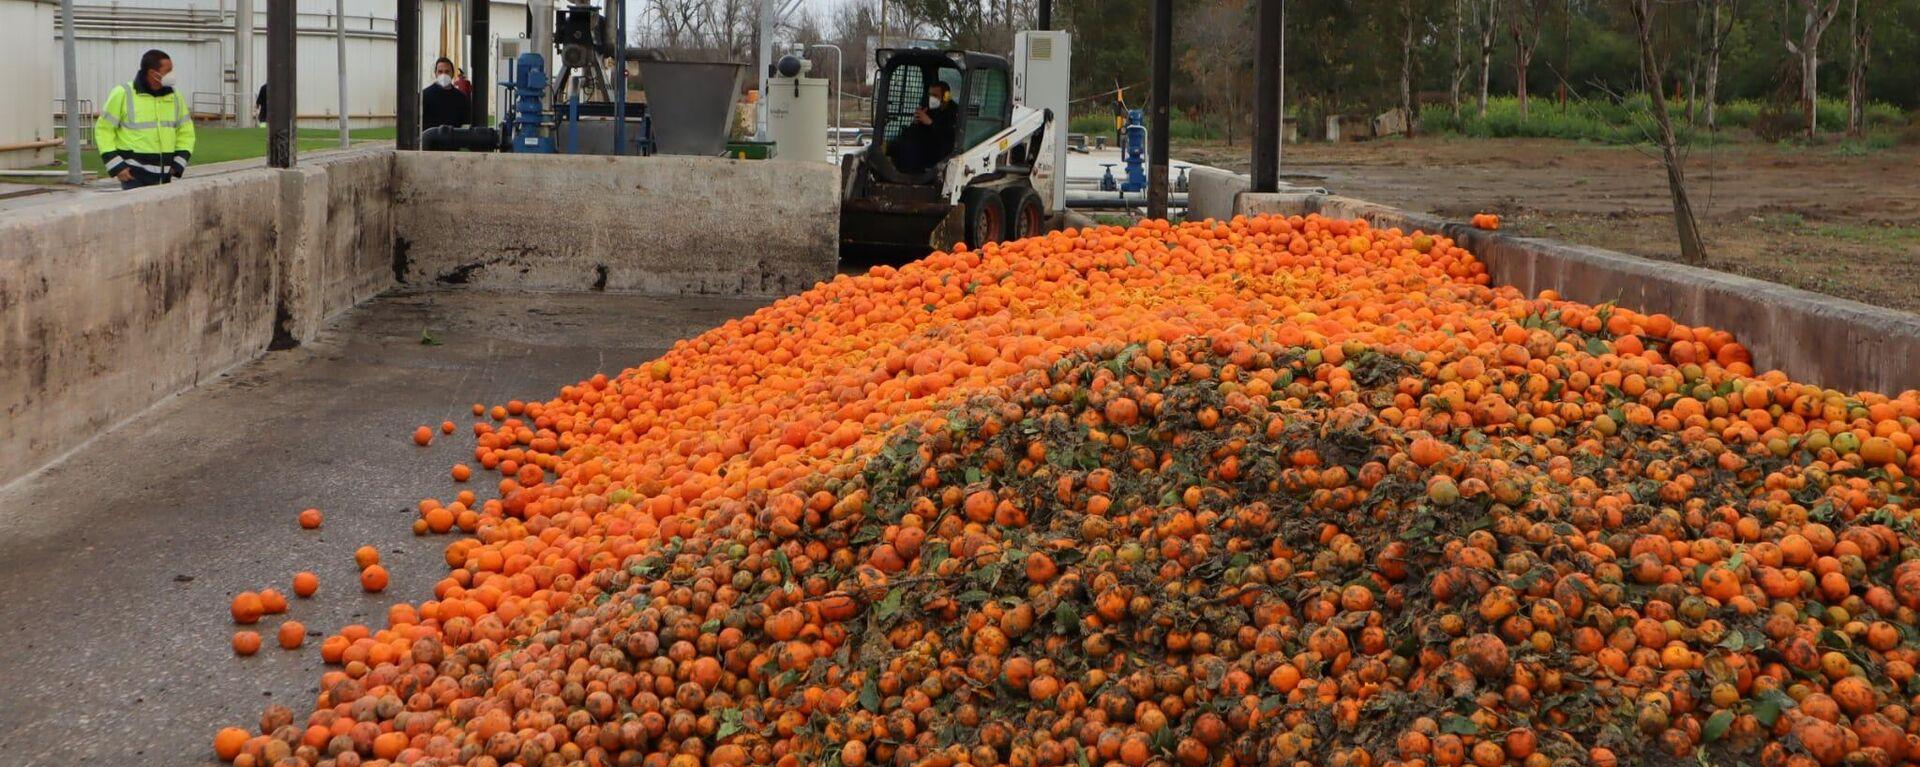 Tratamiento de las naranjas en depuradora - Sputnik Mundo, 1920, 24.02.2021